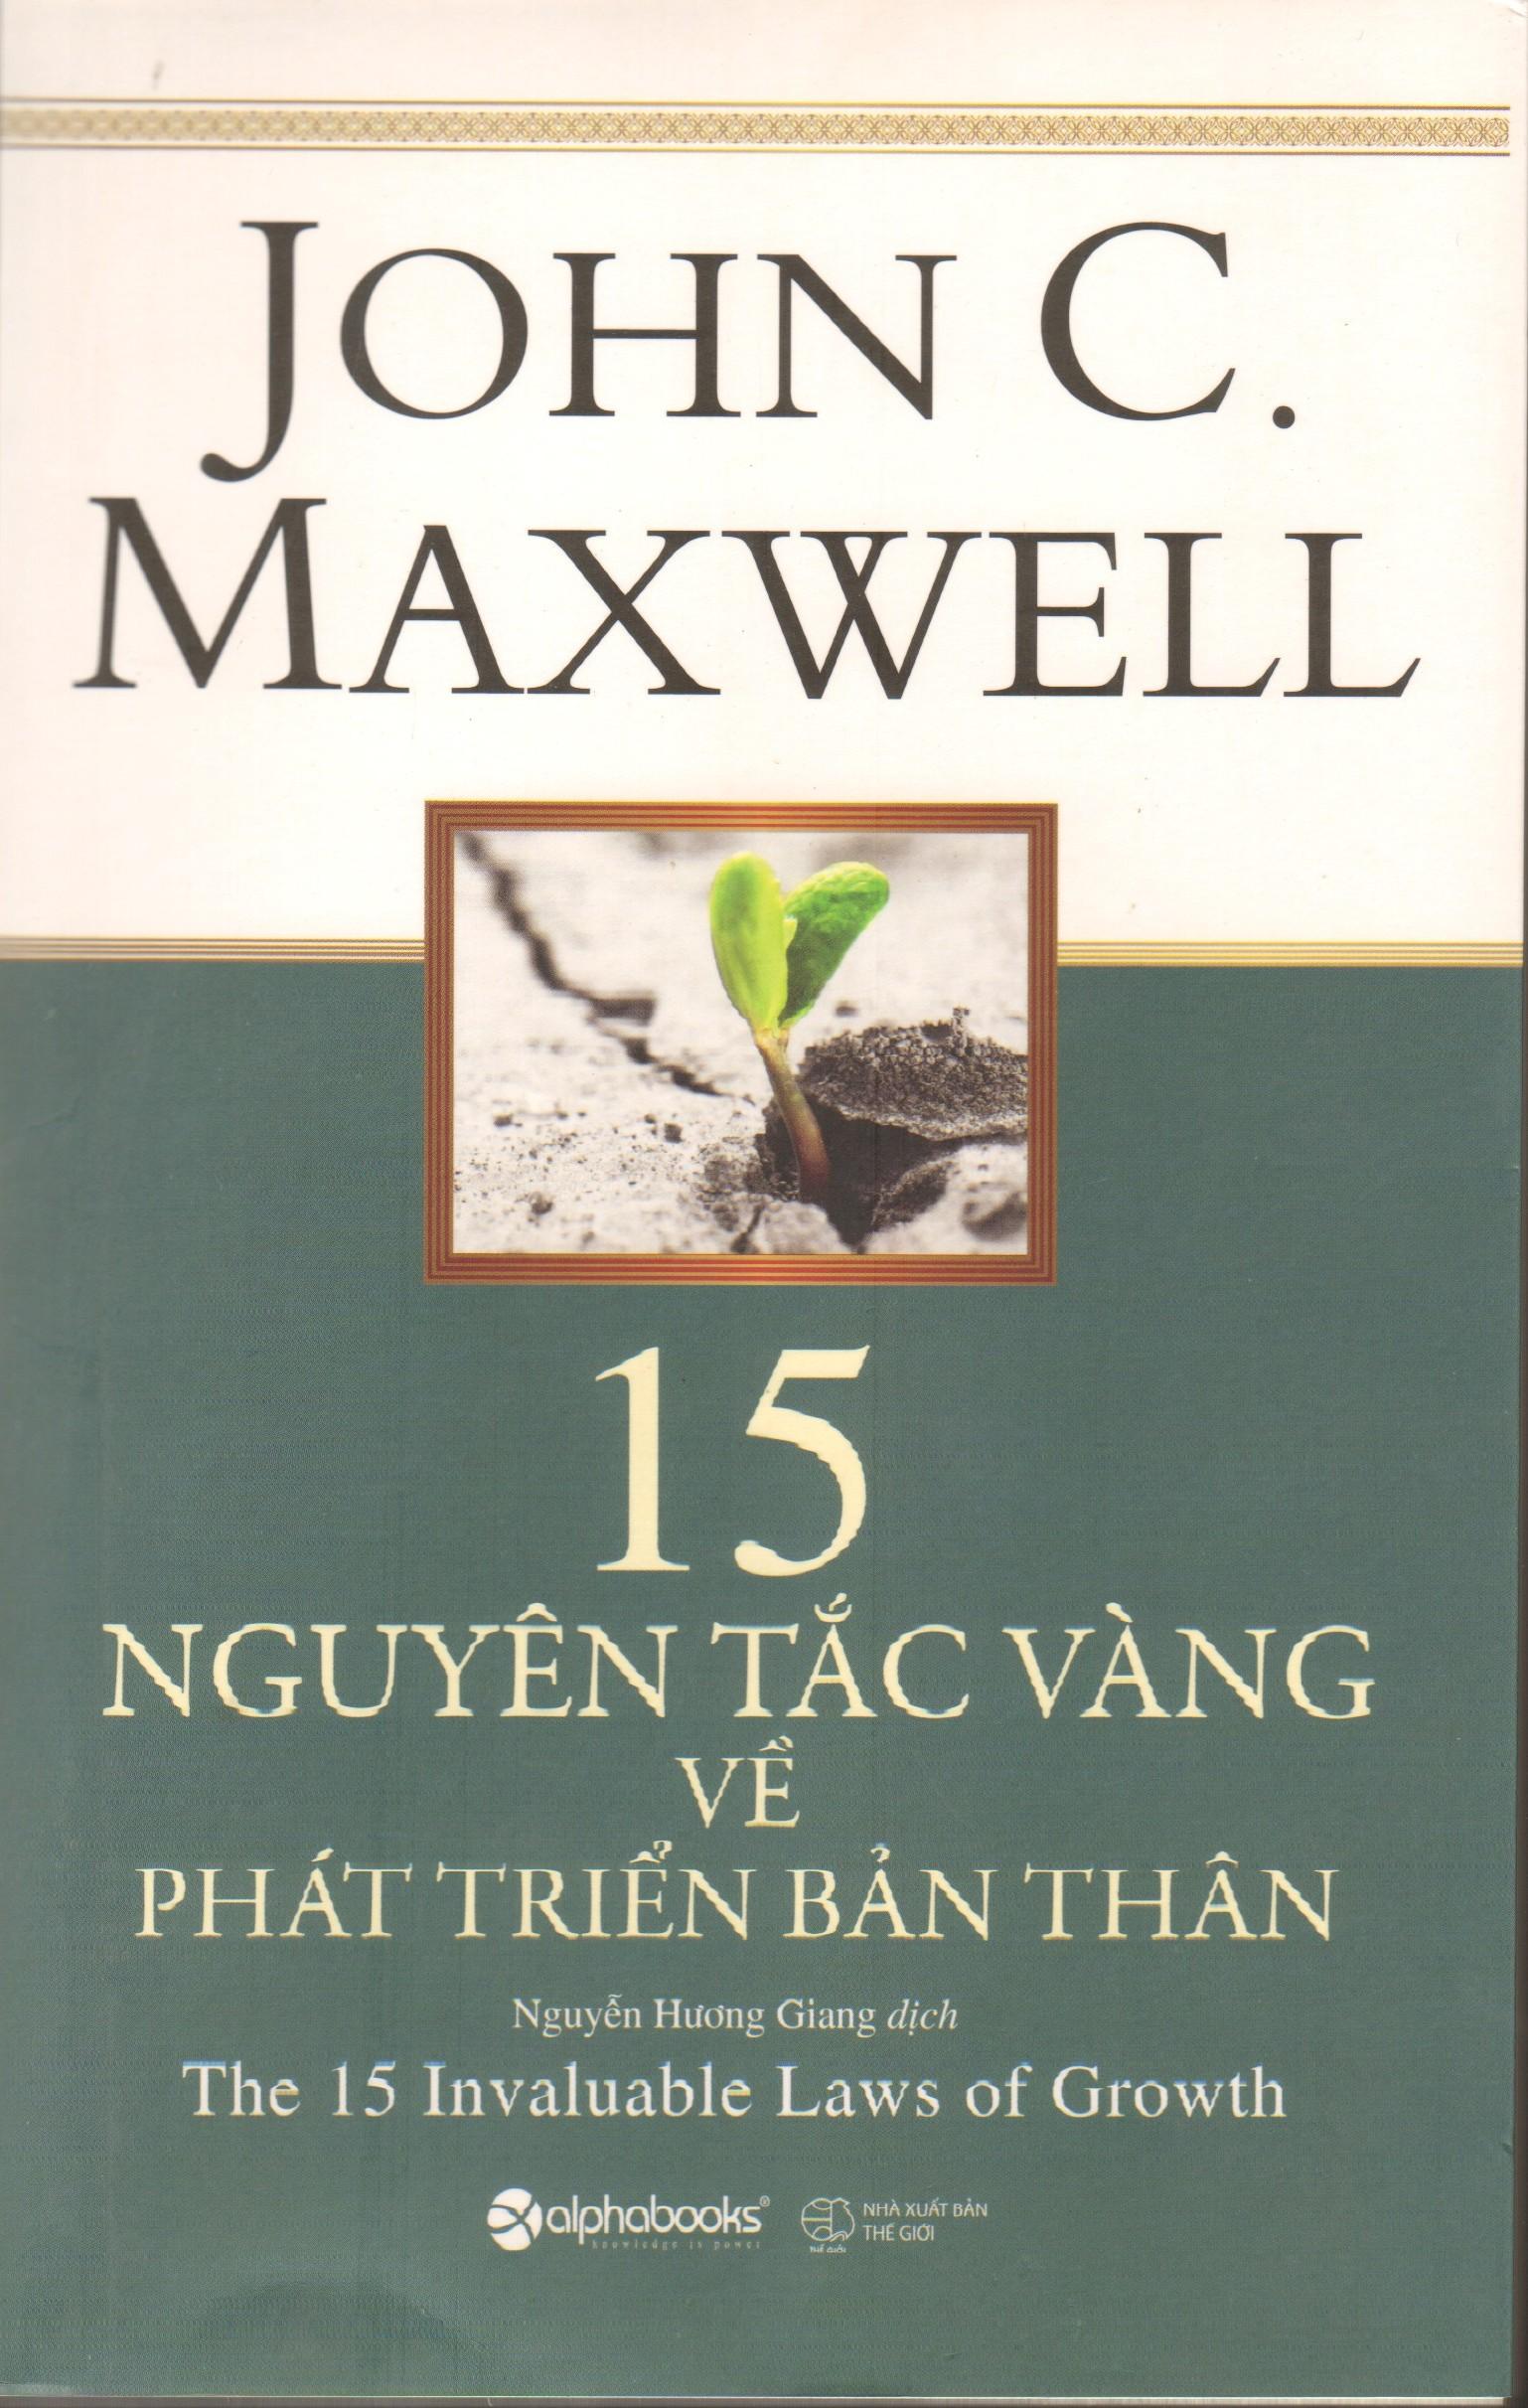 15 Nguyen Tac Vang ve Phat Trien Ban Than